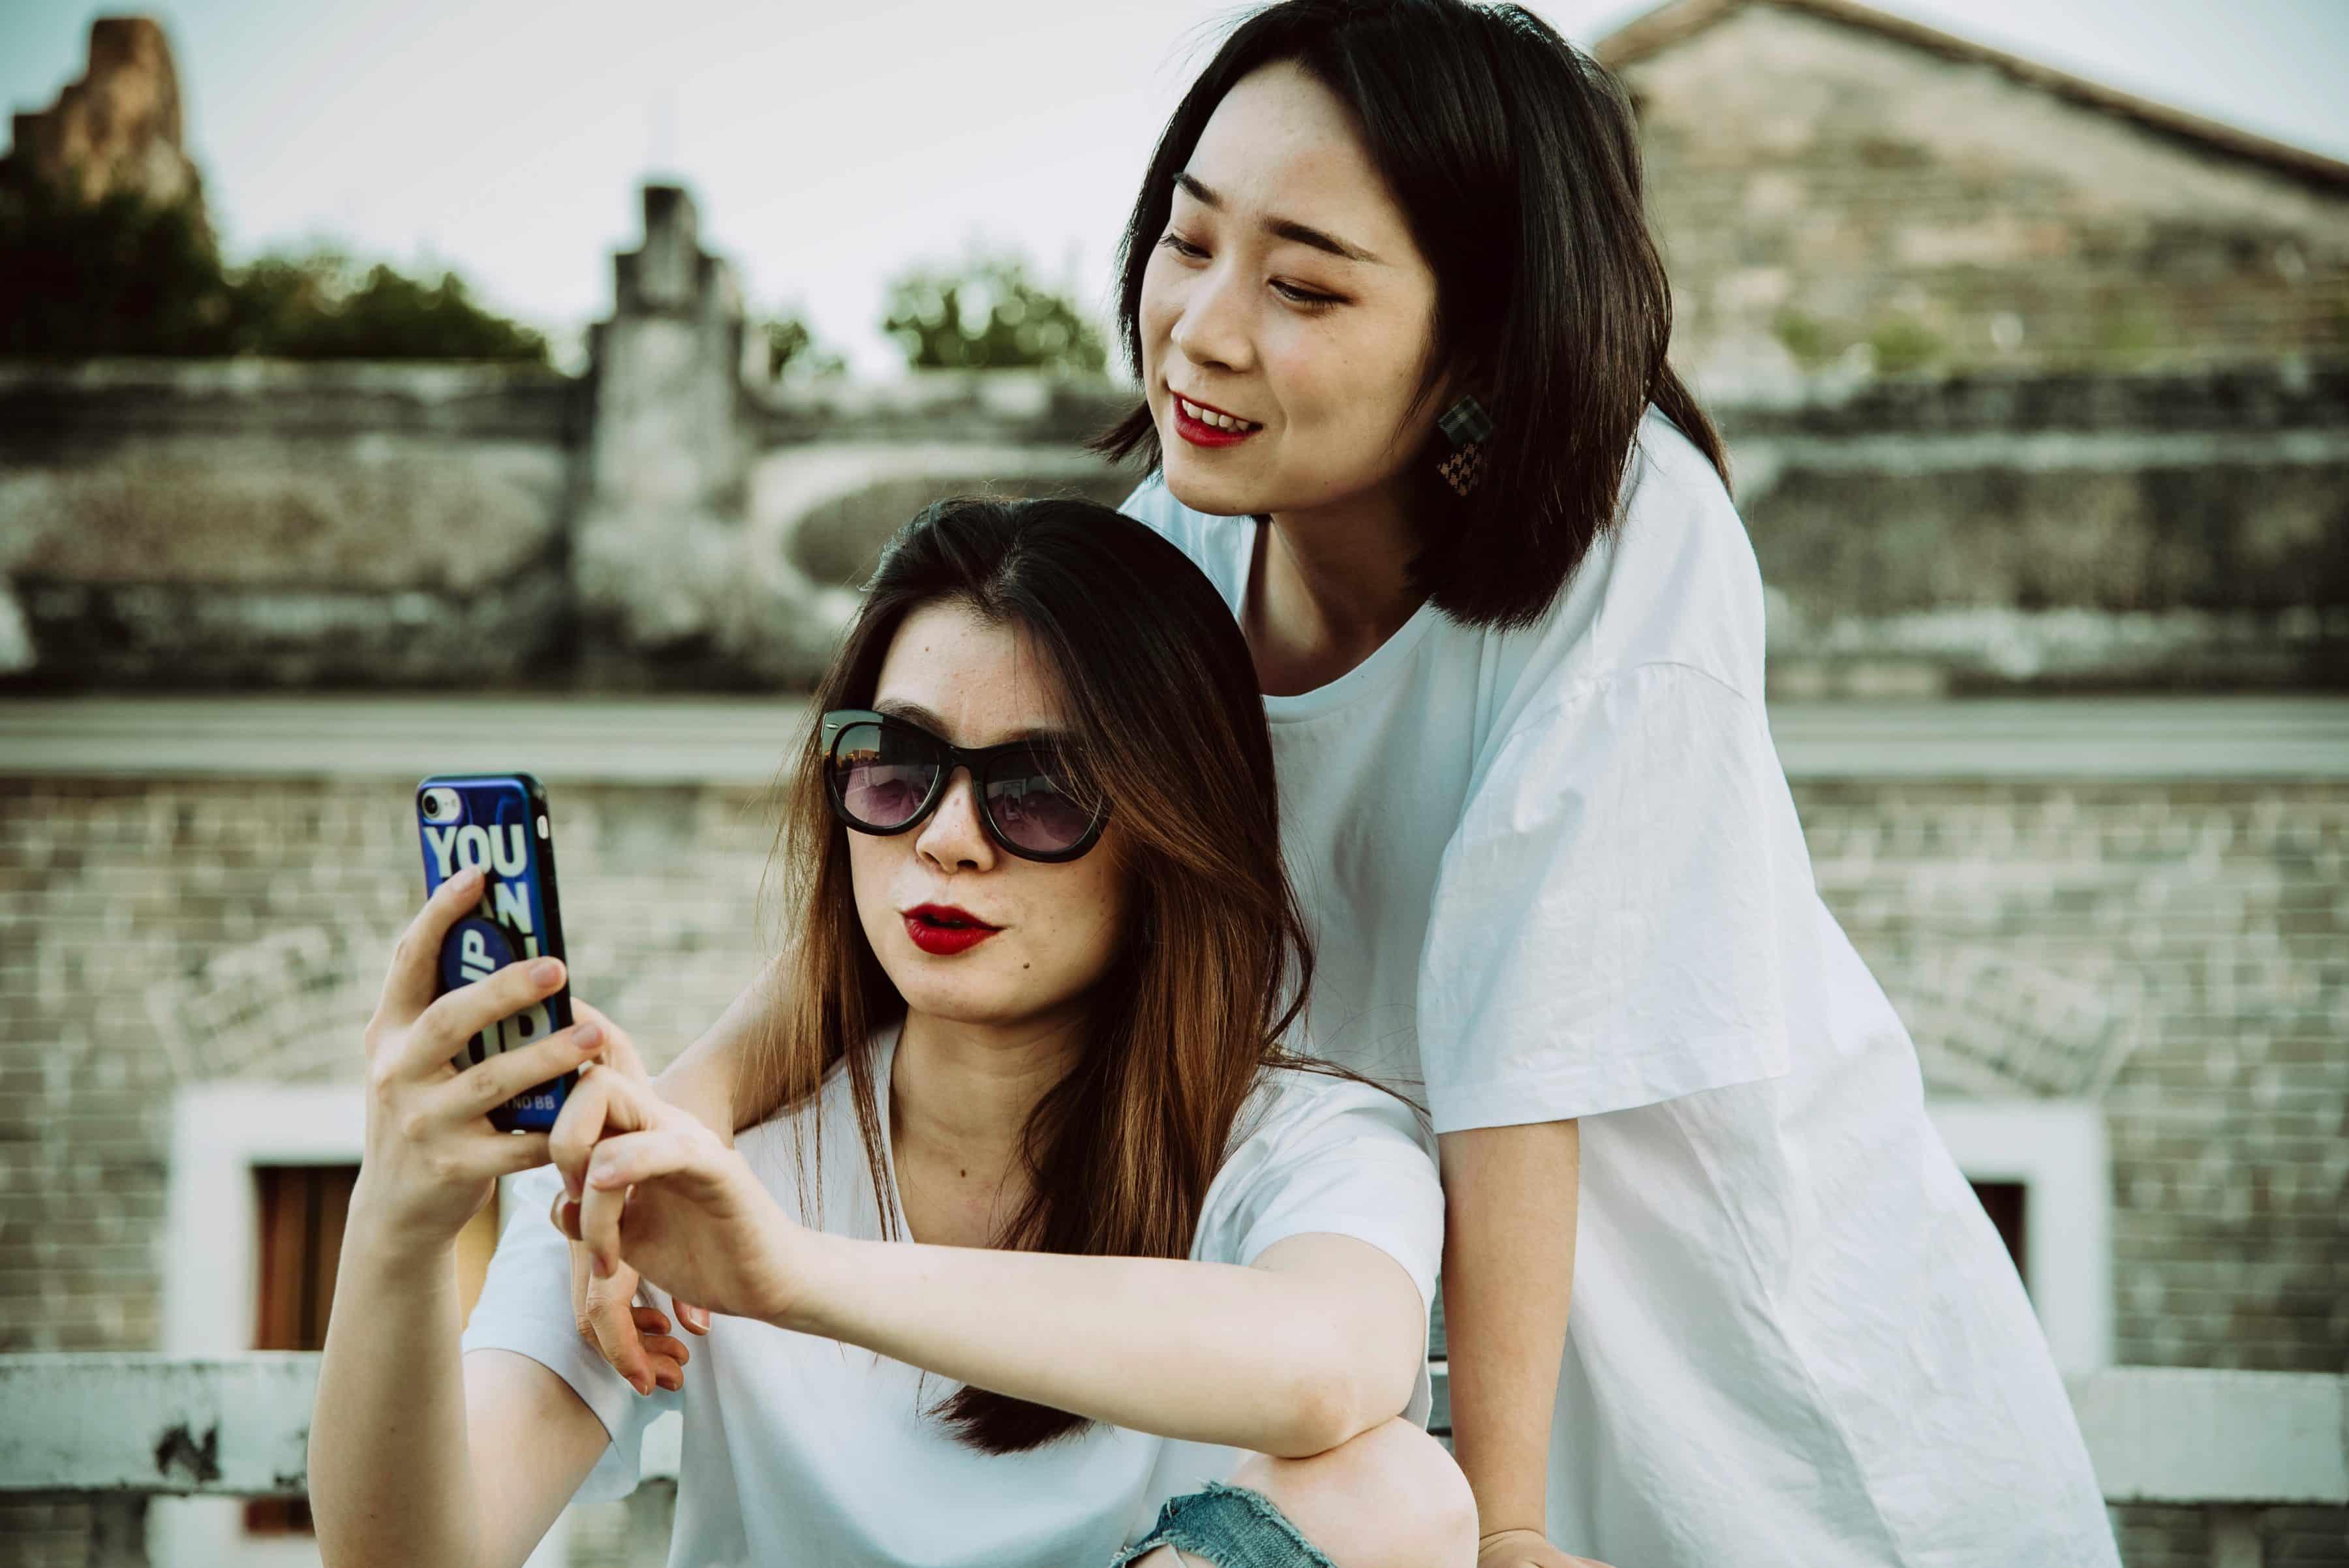 Z 세대에게 가장 인기있는 소셜 네트워크: YouTube, Instagram, Snapchat